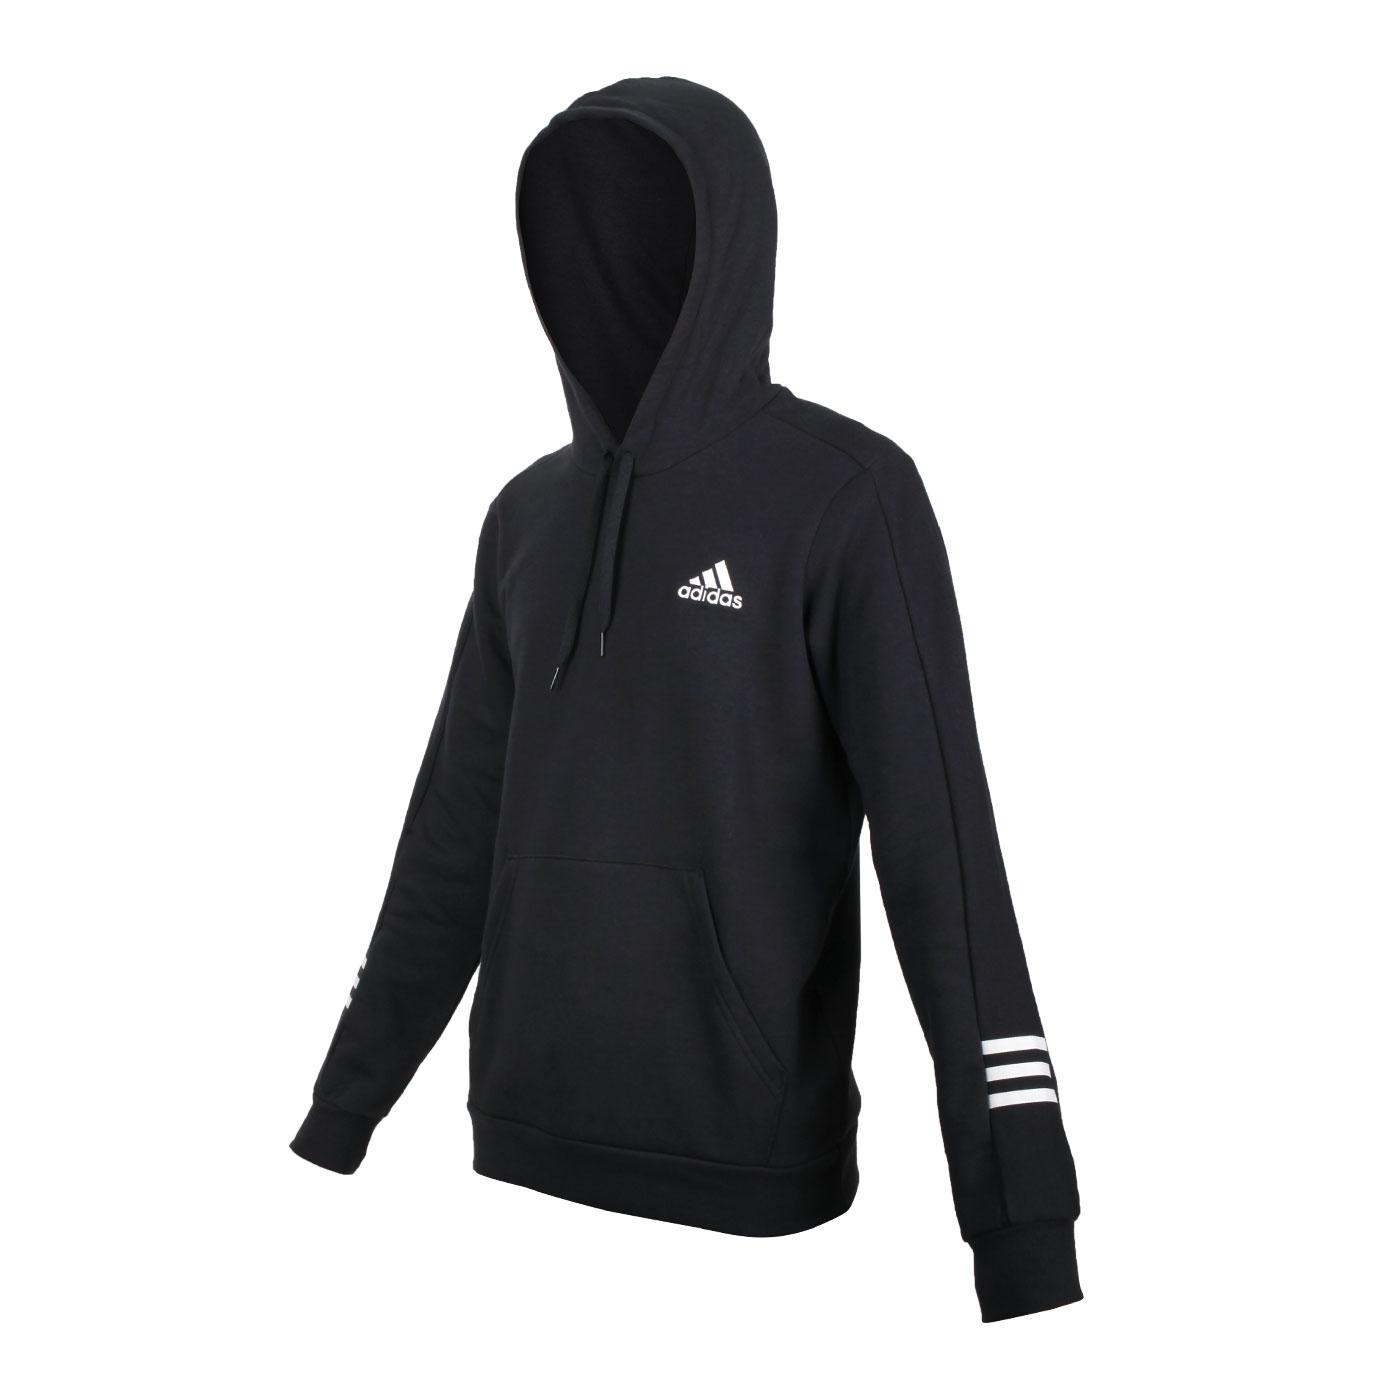 ADIDAS 男款長袖連帽T恤 GD5443 - 黑白